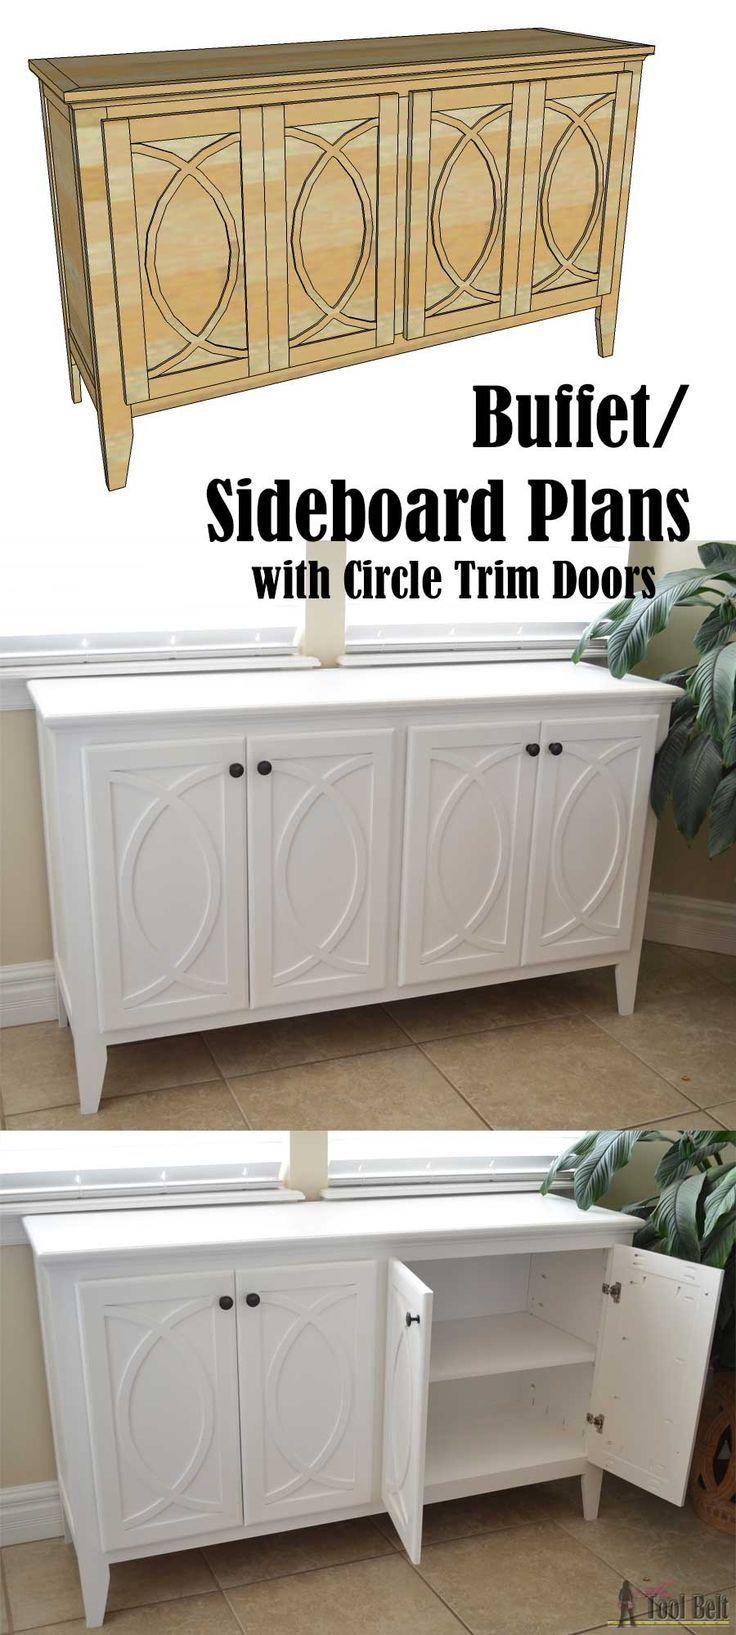 diy buffet sideboard with circle trim doors furniture pinterest rh pinterest com DIY Farmhouse Buffet Cabinet Plans diy buffet from kitchen cabinets